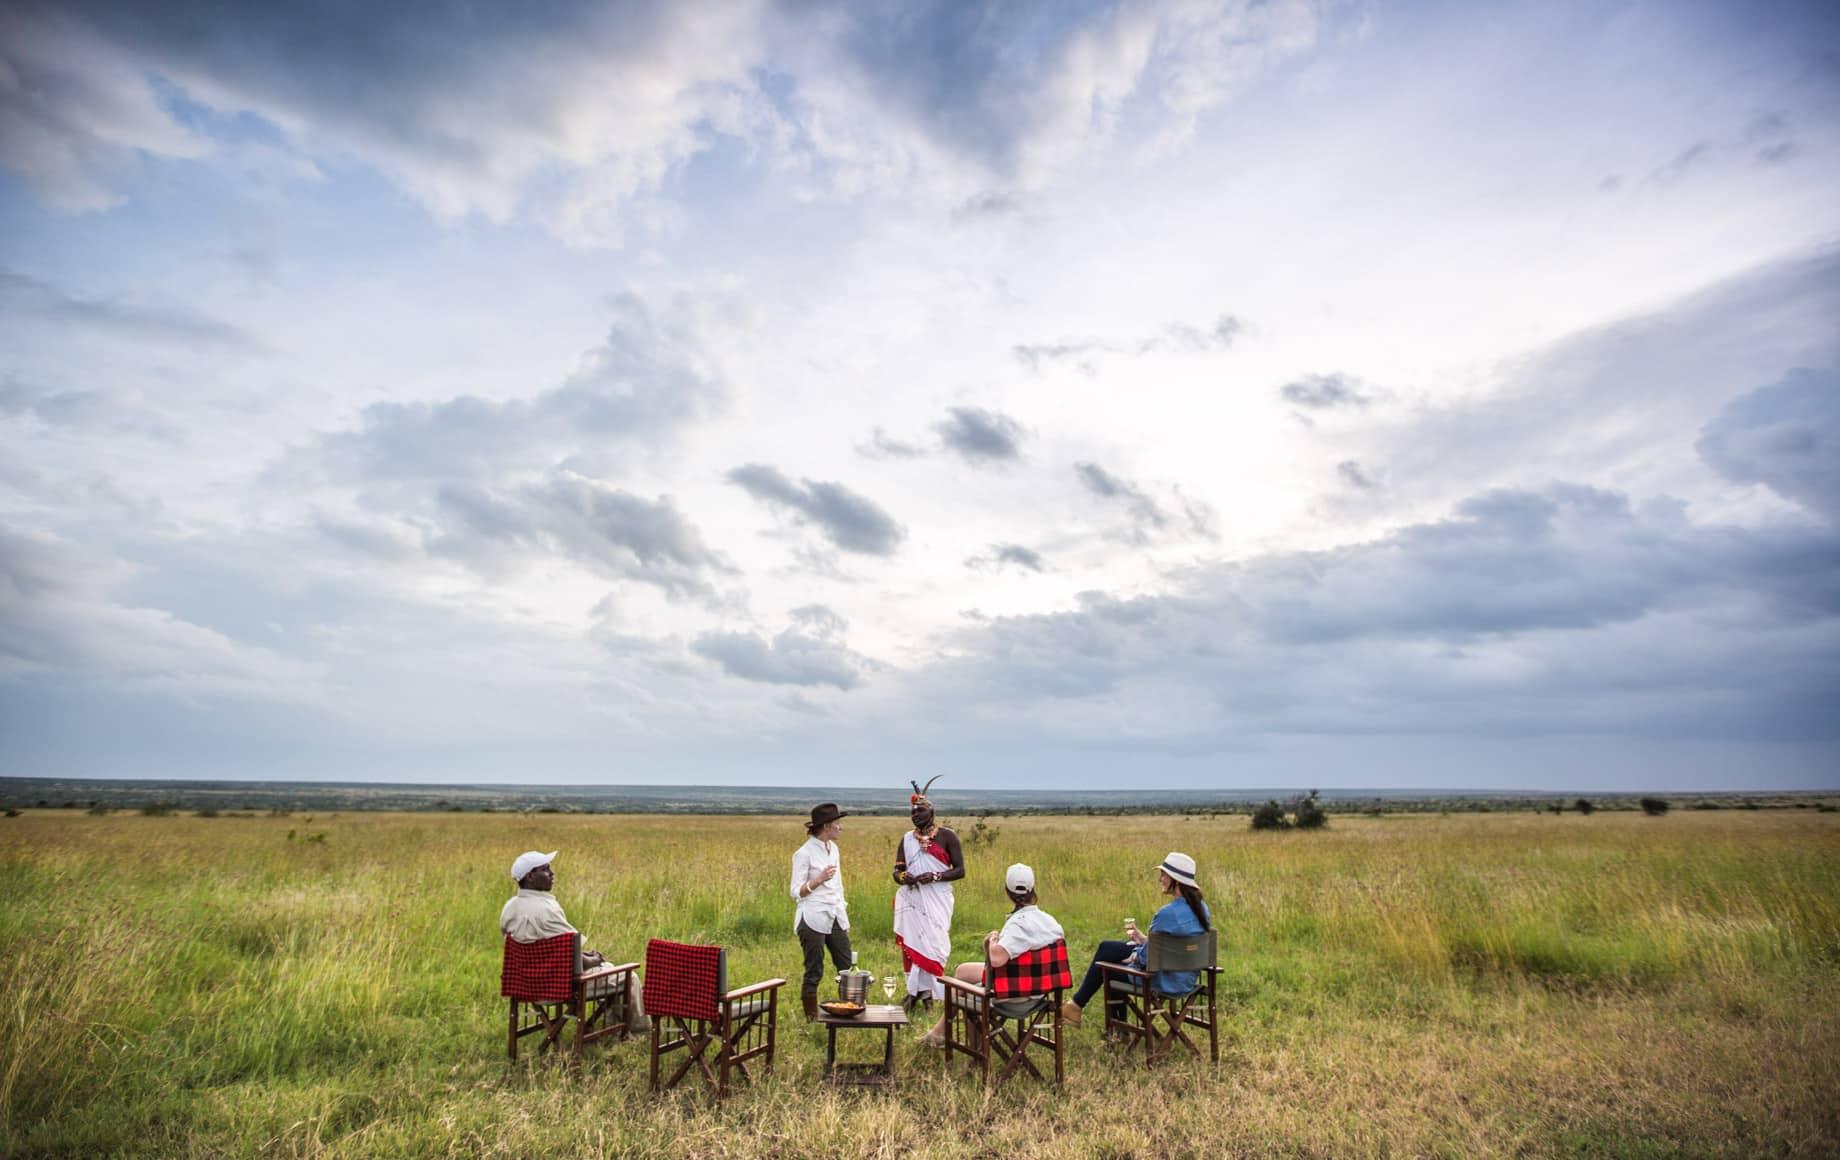 Safari-goers take a rest in Loisaba Conservancy